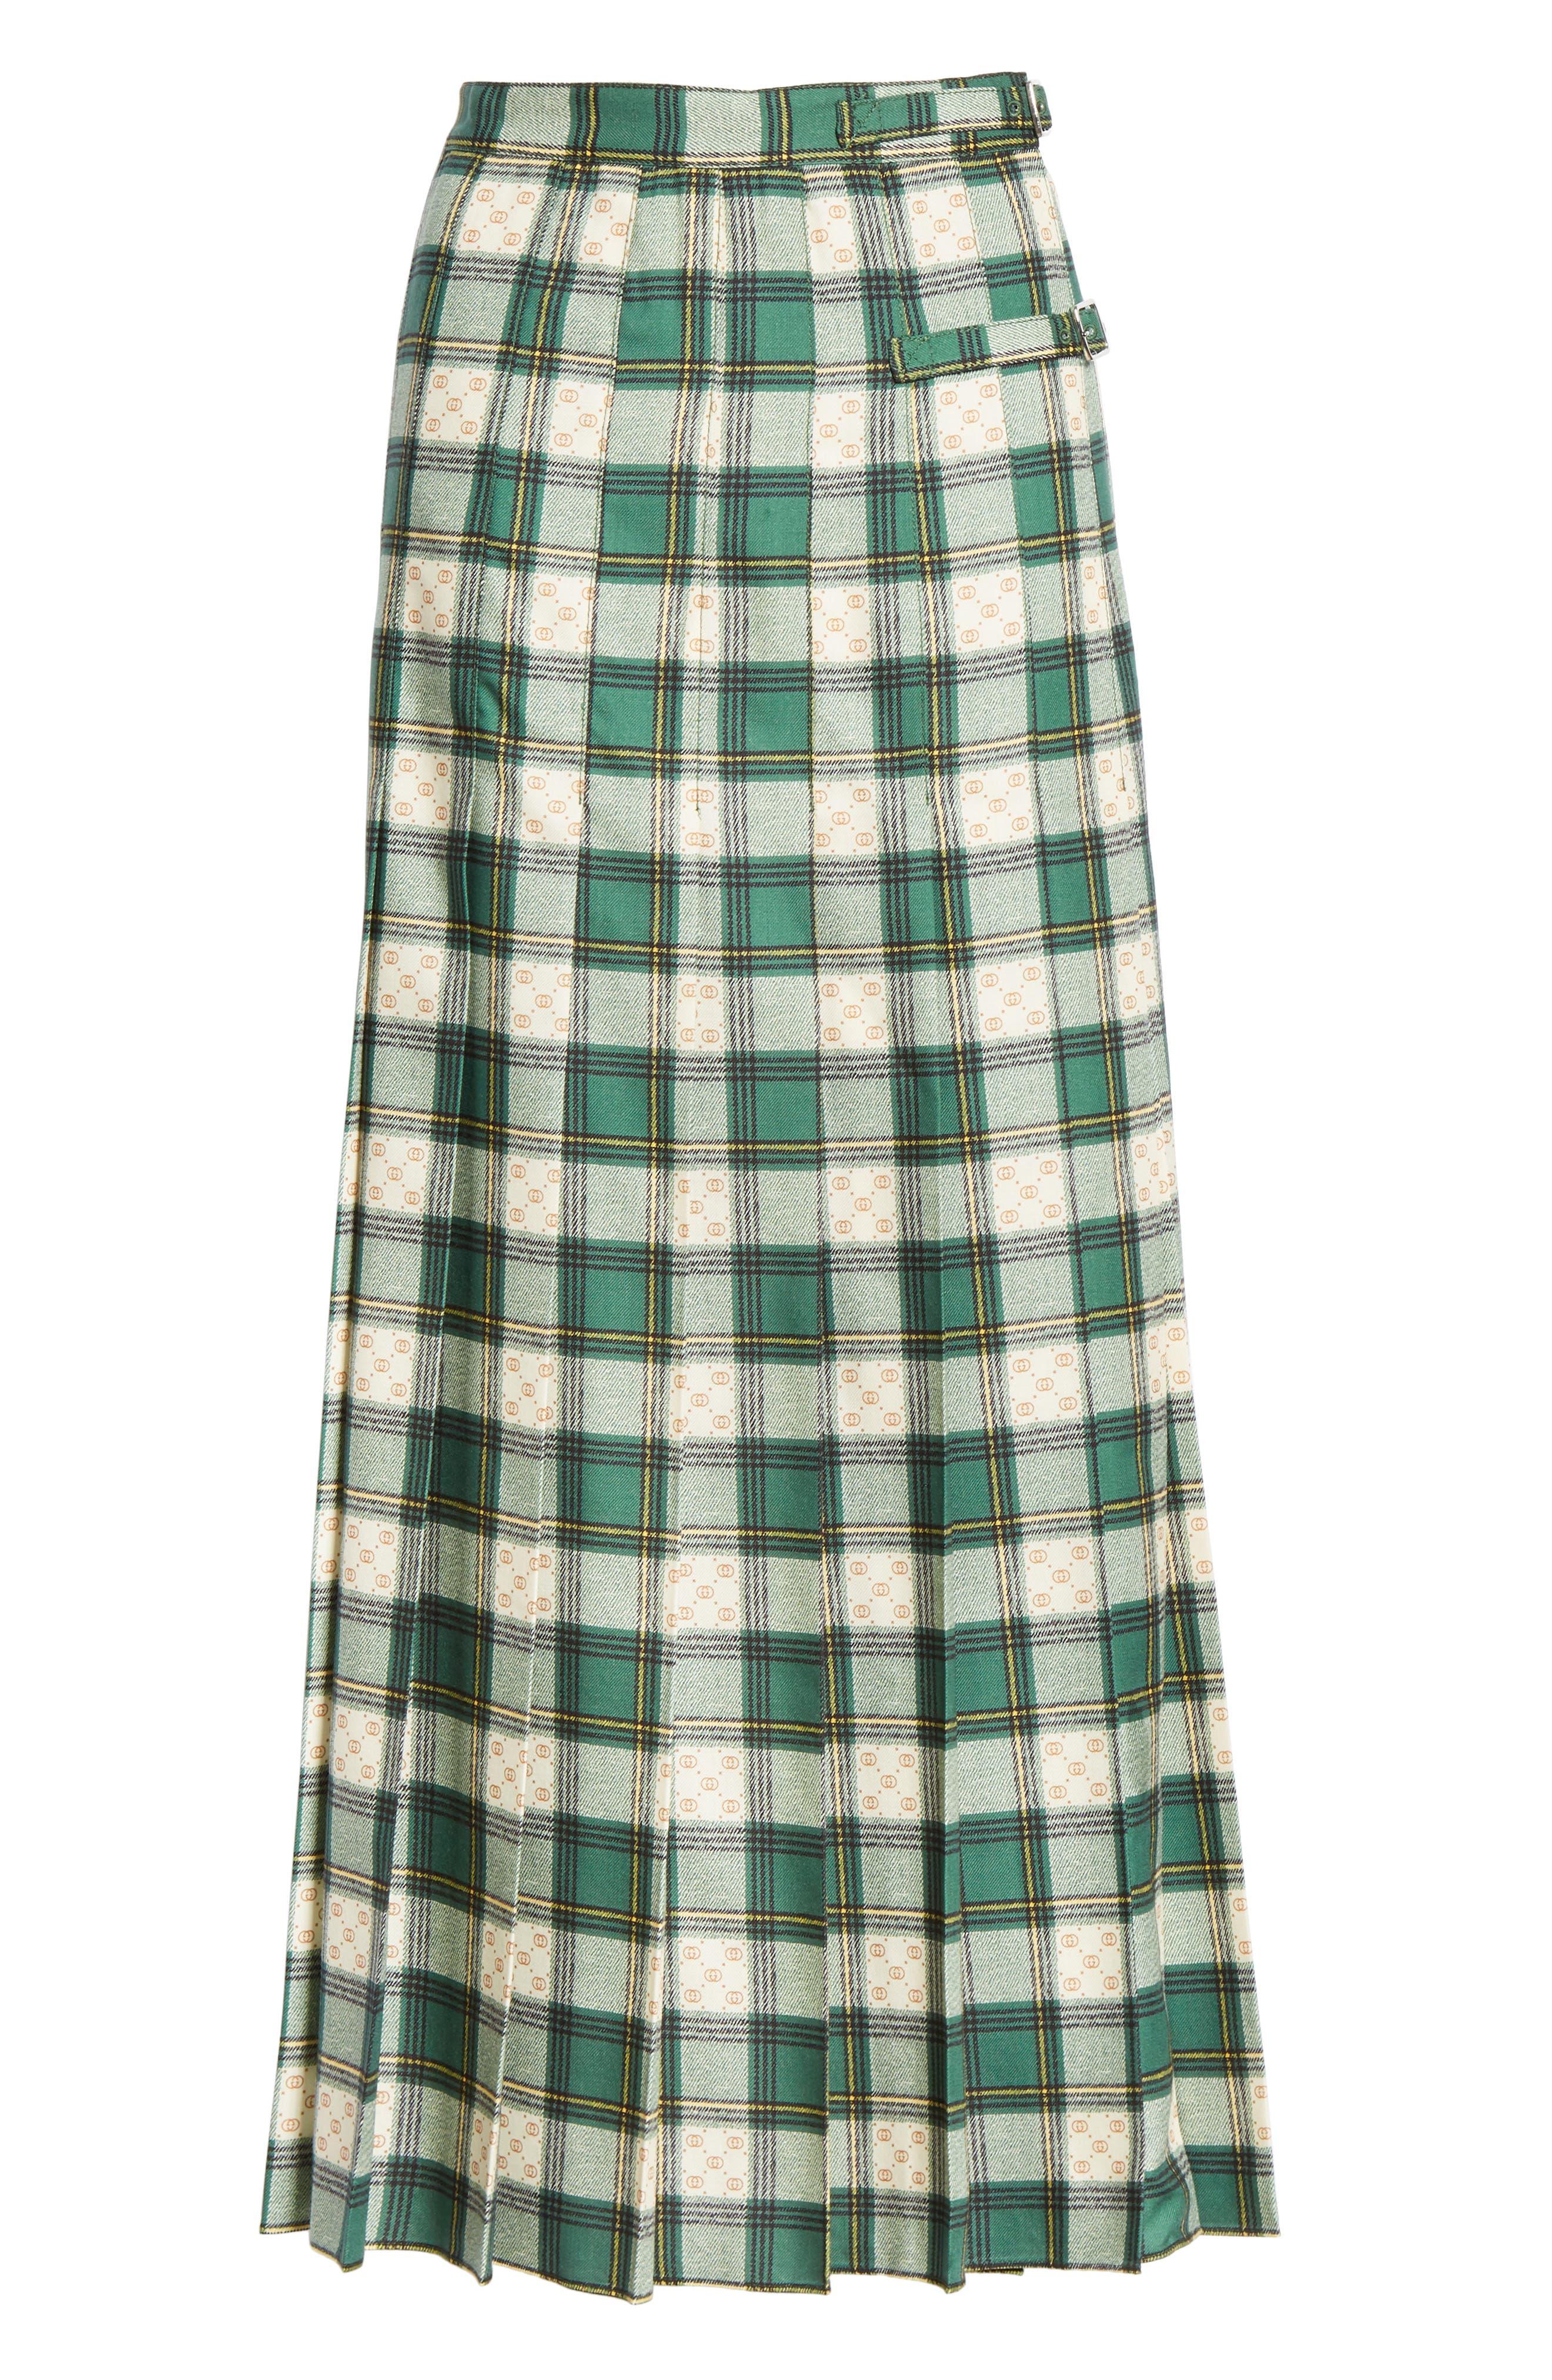 Tartan Check Wool Twill Maxi Skirt,                             Alternate thumbnail 3, color,                             3741 GREEN/ ROSE BEIGE PRI